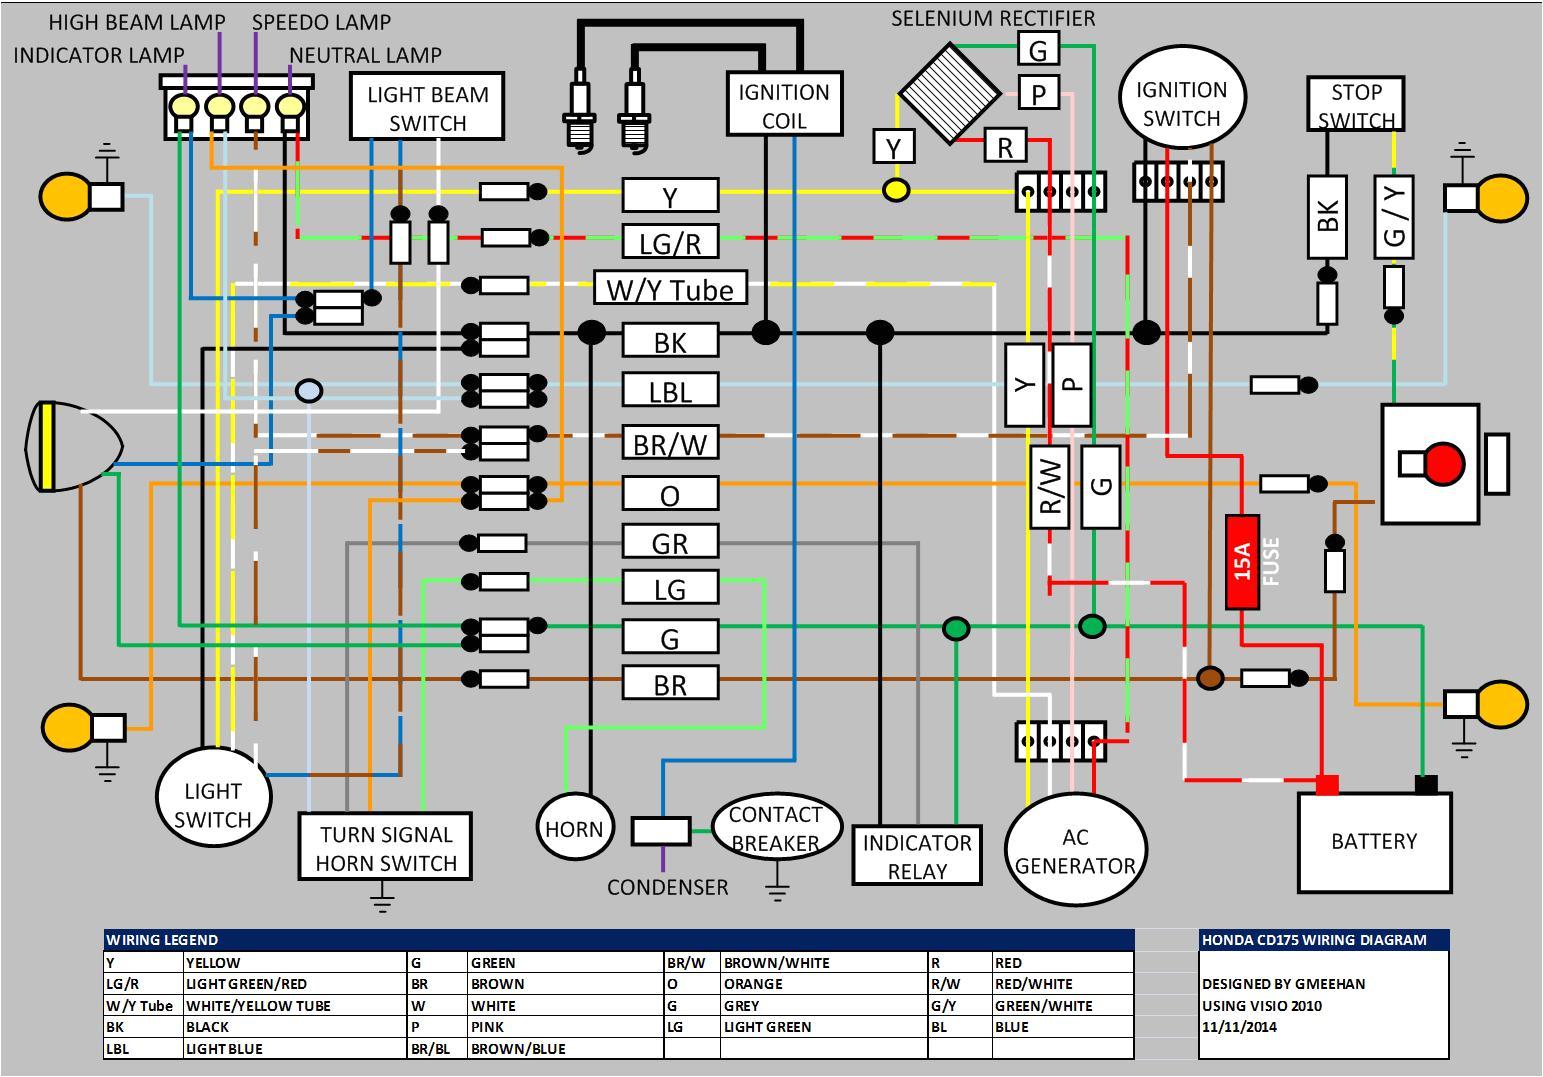 honda electrical diagram wiring diagram page 1981 honda cb125s wiring diagram honda 125s wiring diagram